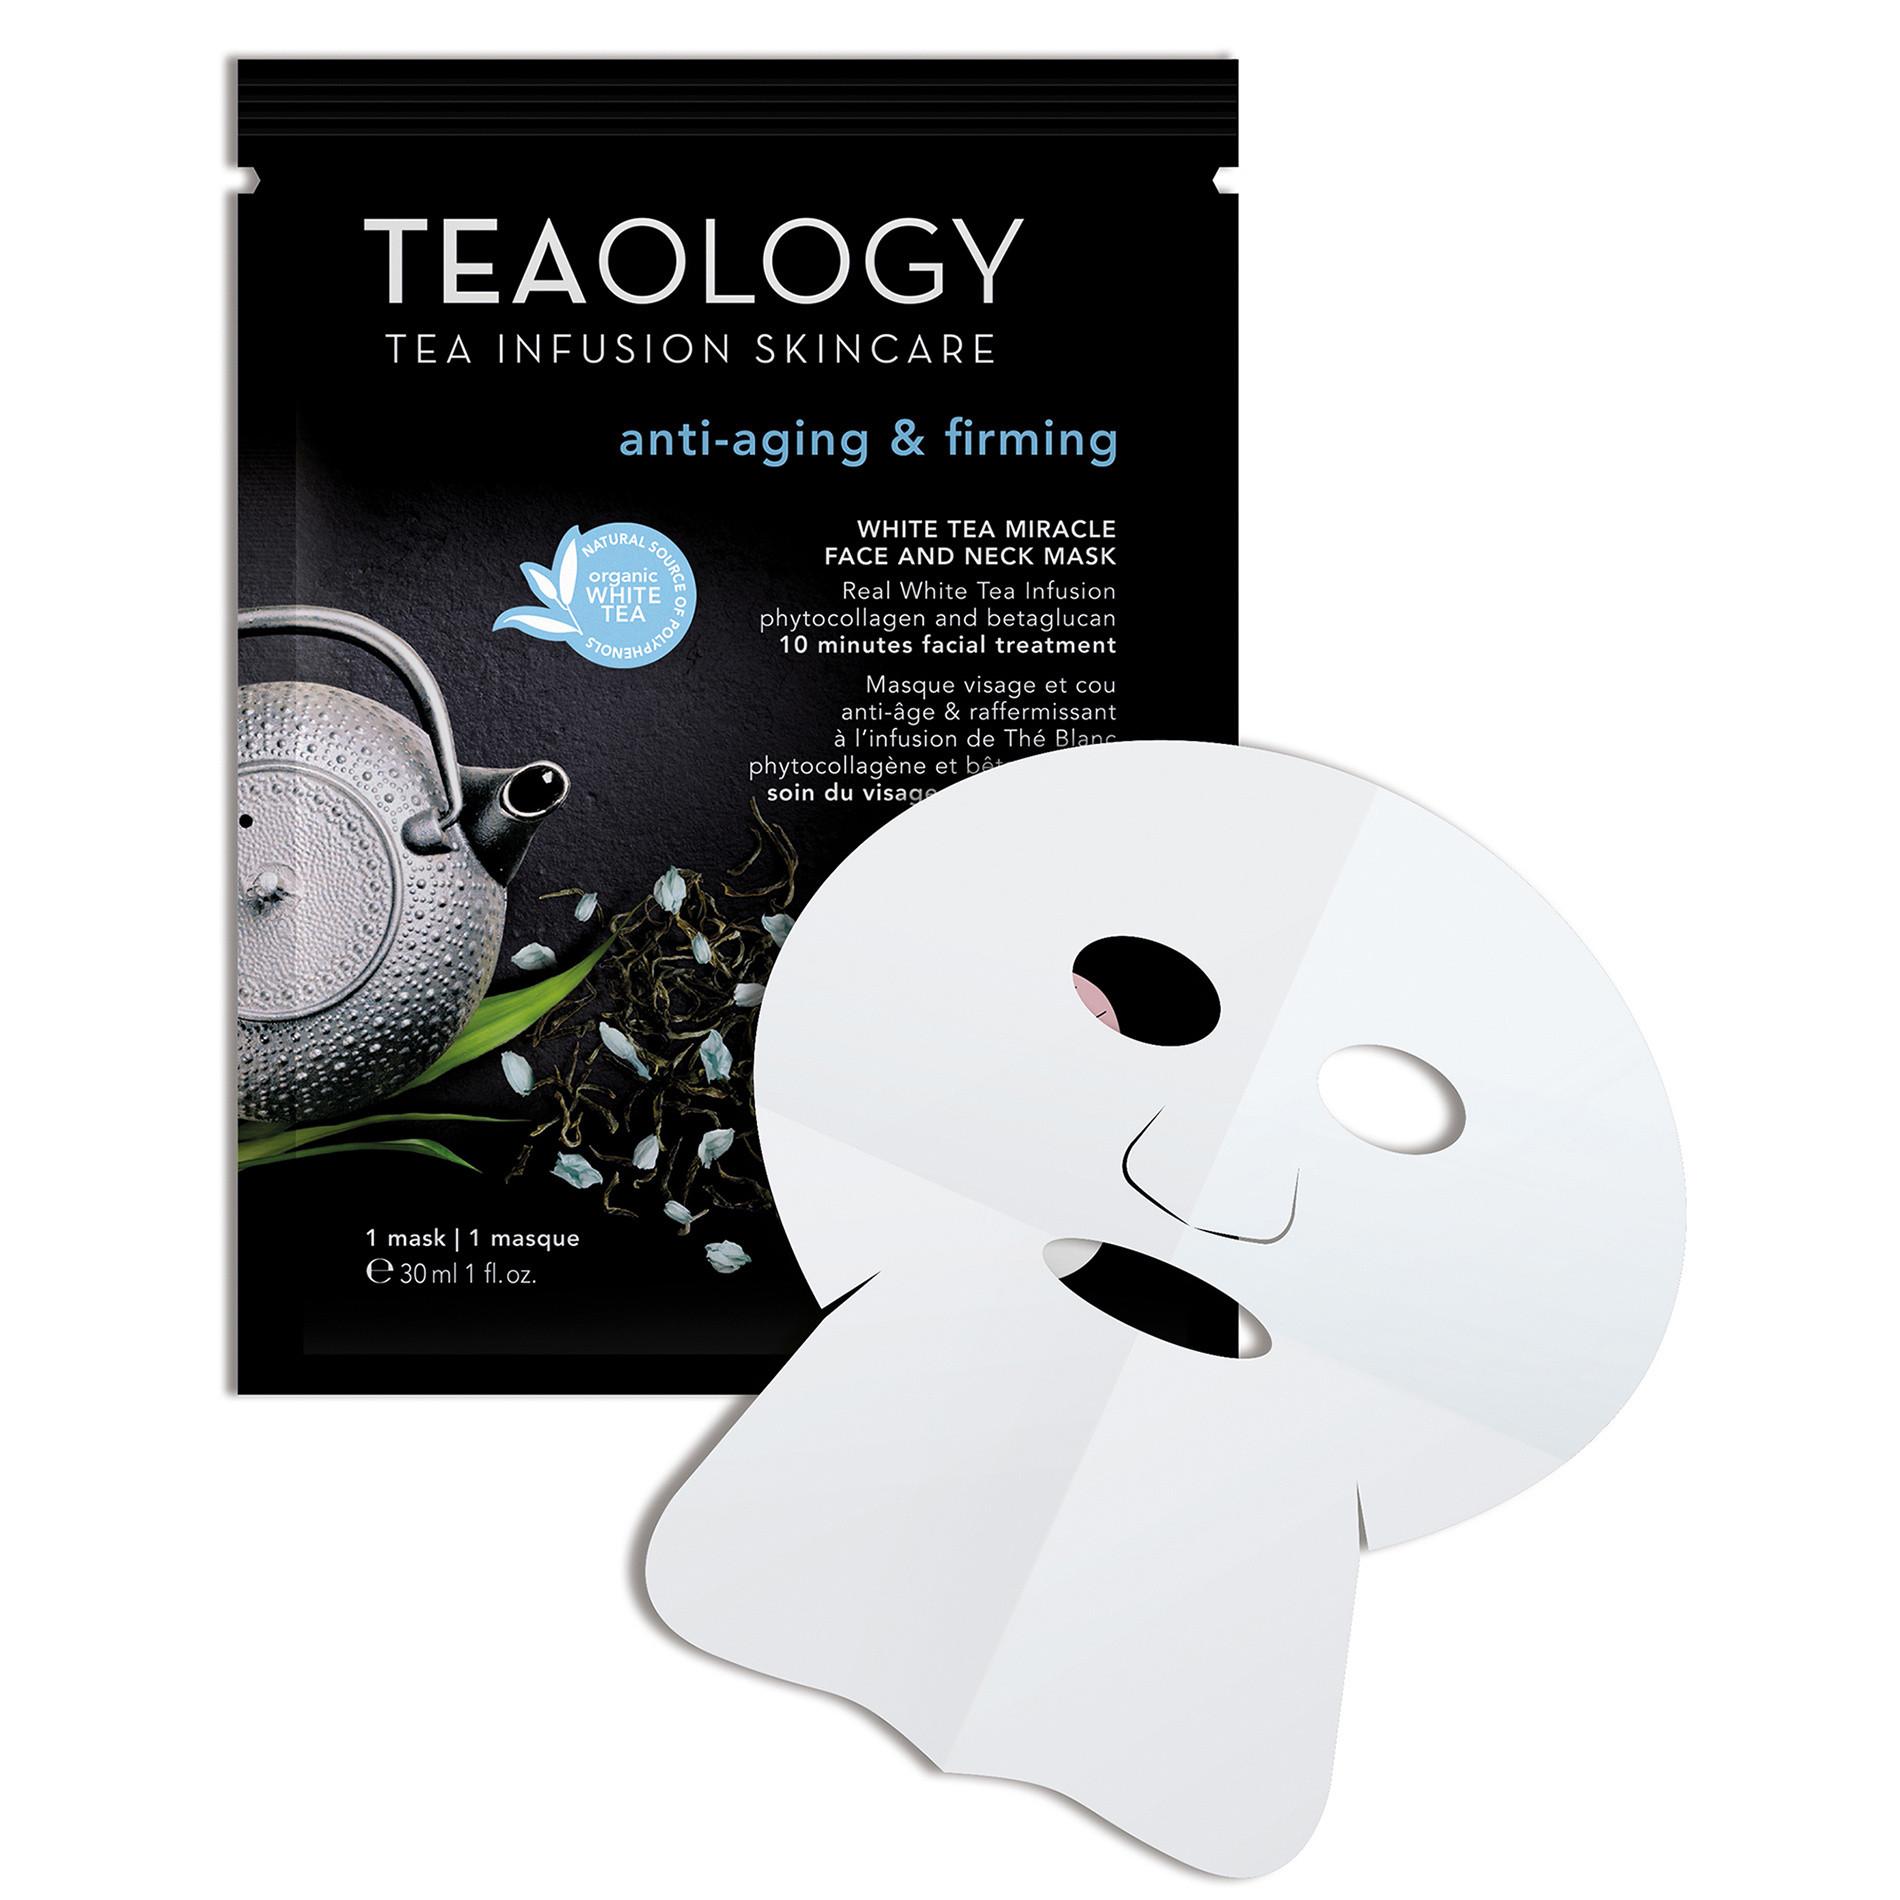 White Tea Miracle Maschera Viso e Collo Anti-aging  30 ml, Nero, large image number 1